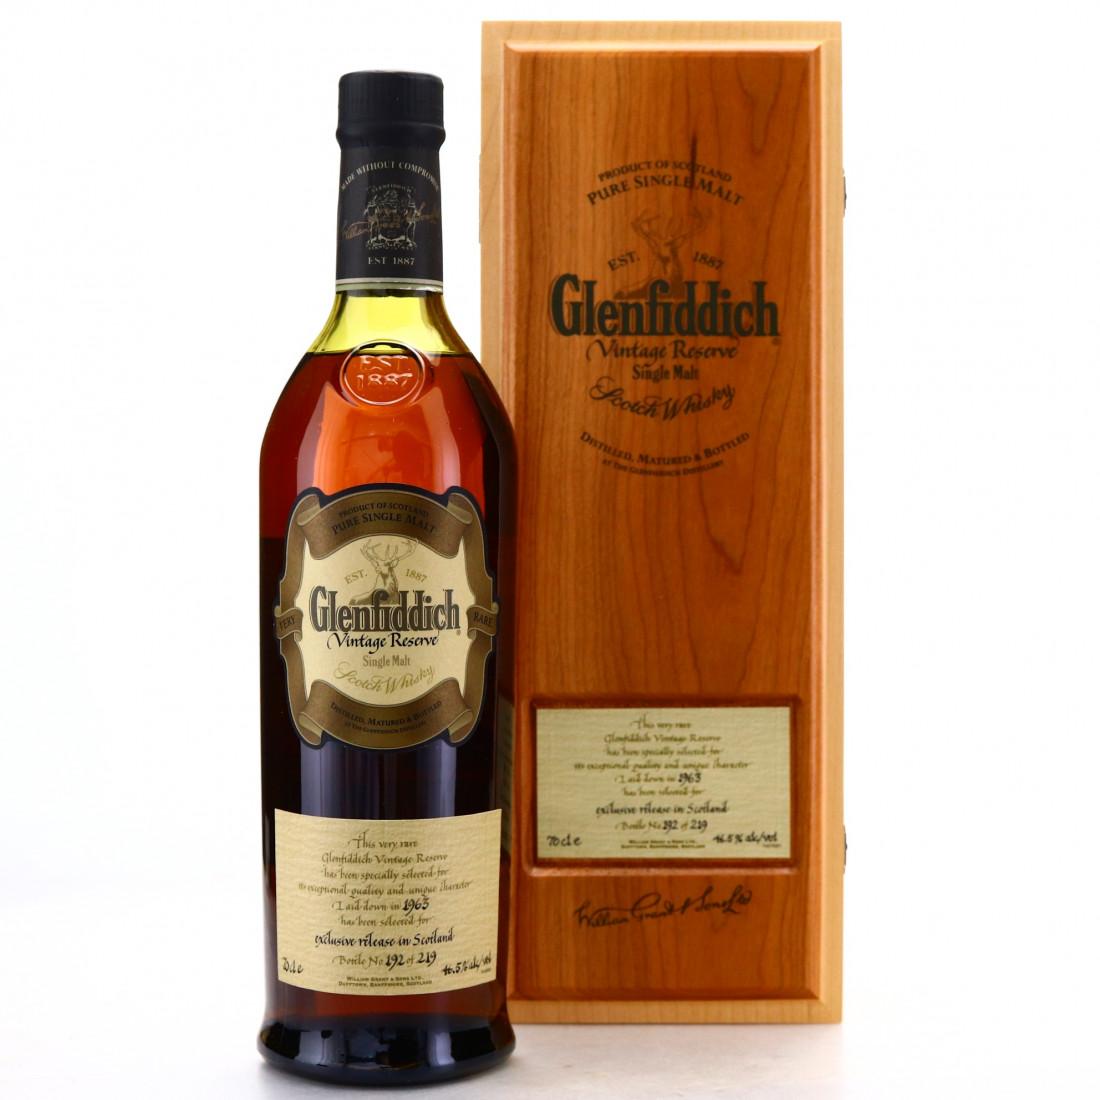 Glenfiddich 1963 Vintage Reserve #12730 / Scottish Exclusive